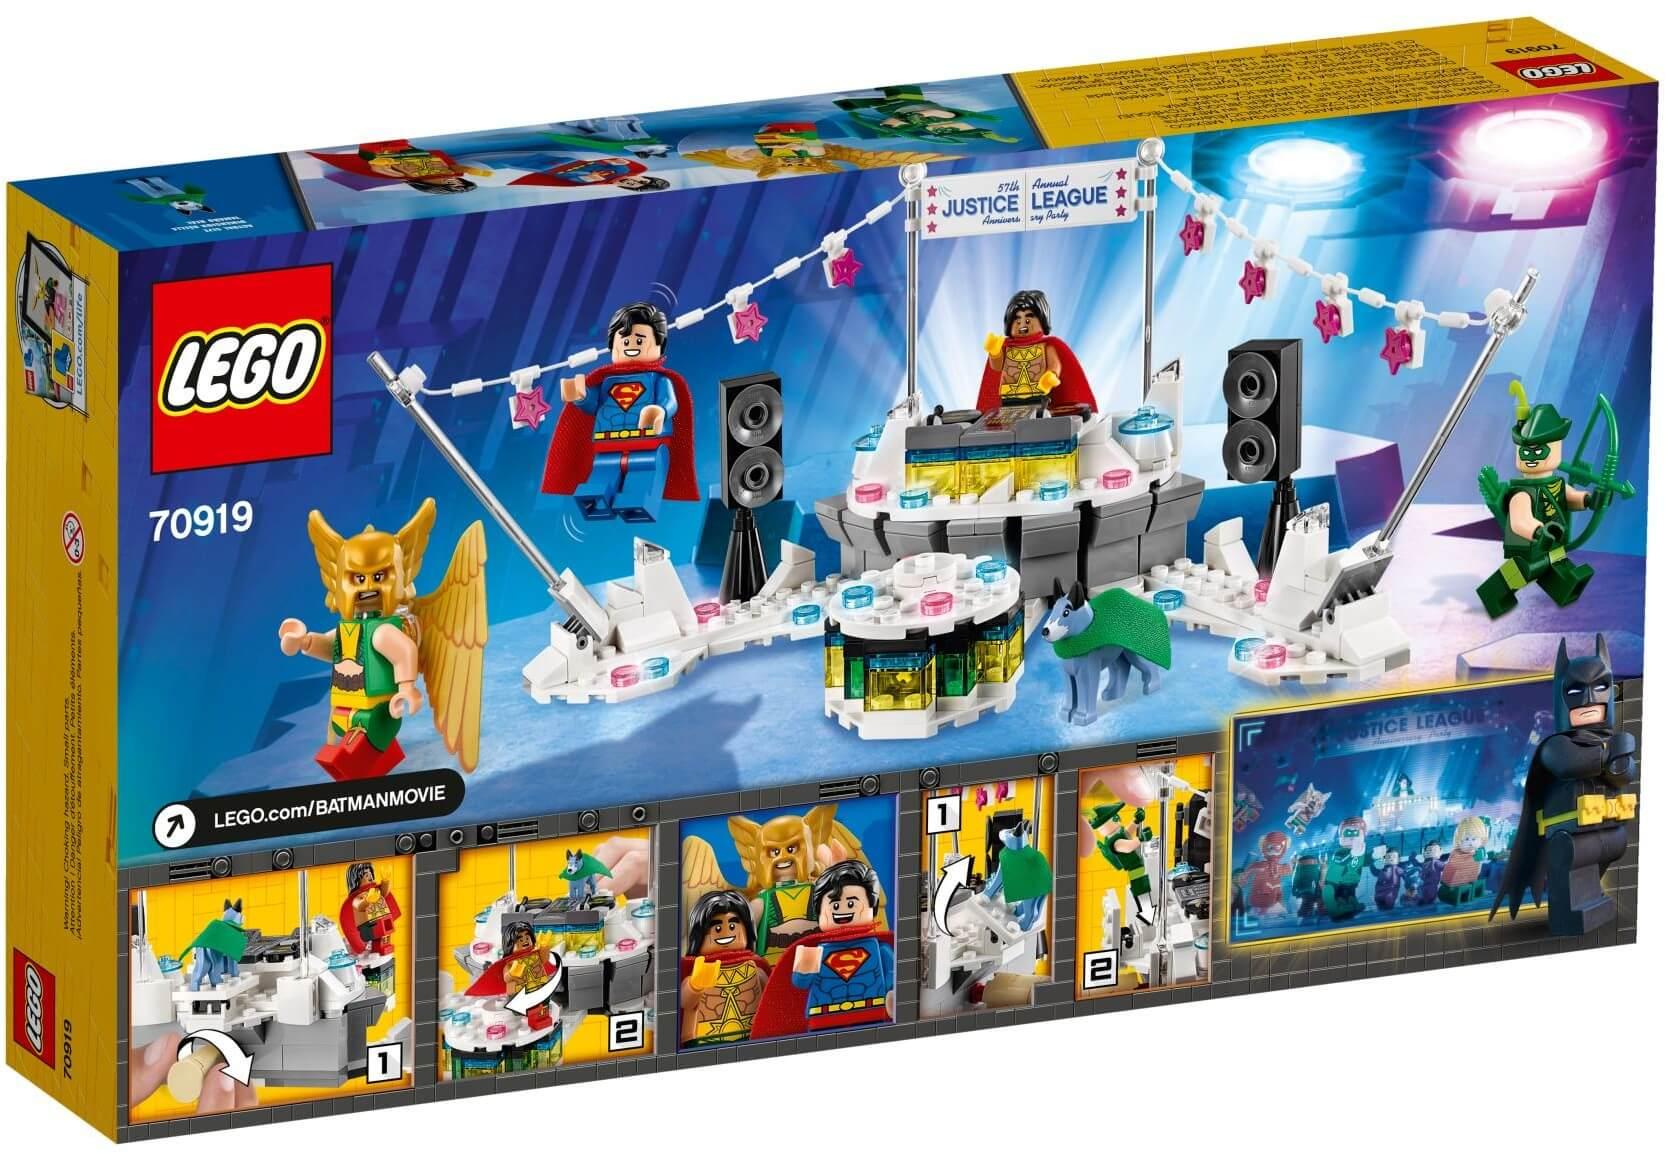 Mua đồ chơi LEGO 70919 - LEGO The Batman Movie 70919 - Anh Hùng Hội Tụ (LEGO The Batman Movie 70919 The Justice League Anniversary Party)